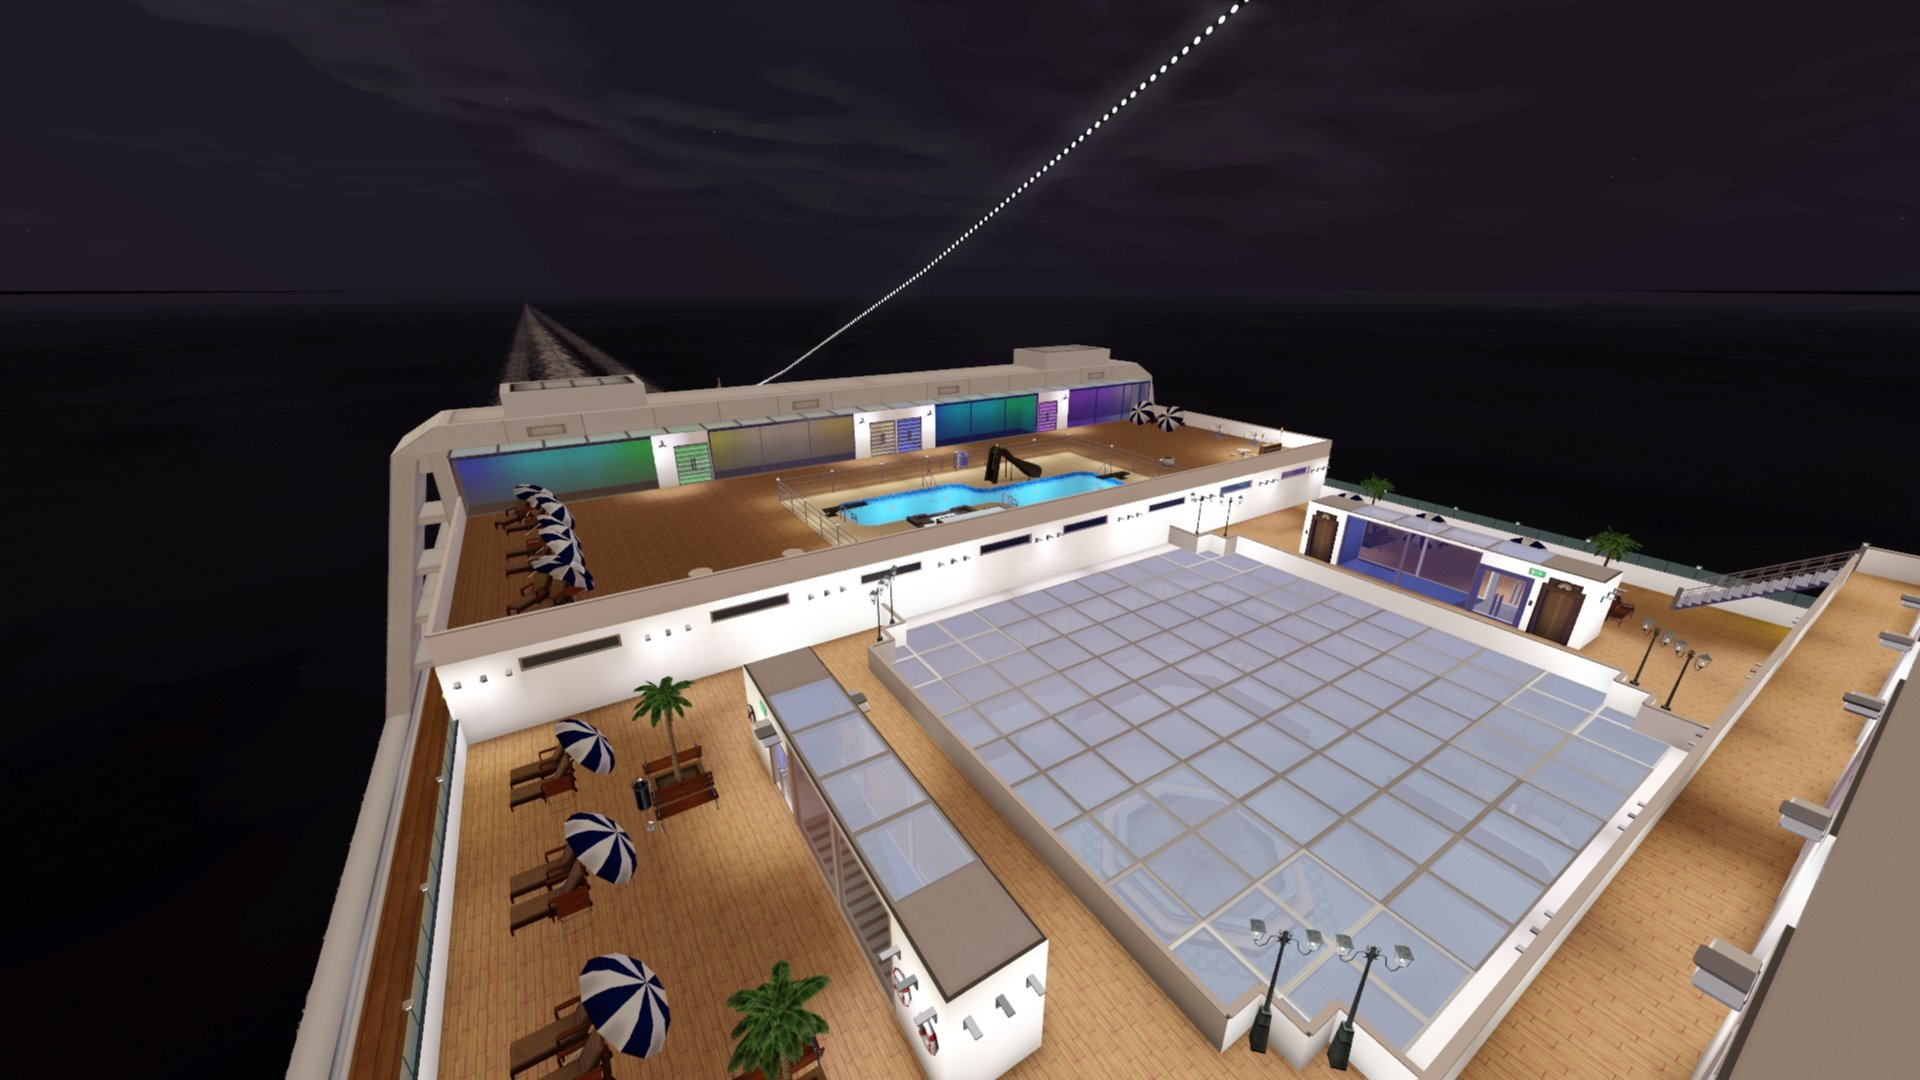 Mod The Sims - MS Plumbob Dream - Captain's Deck